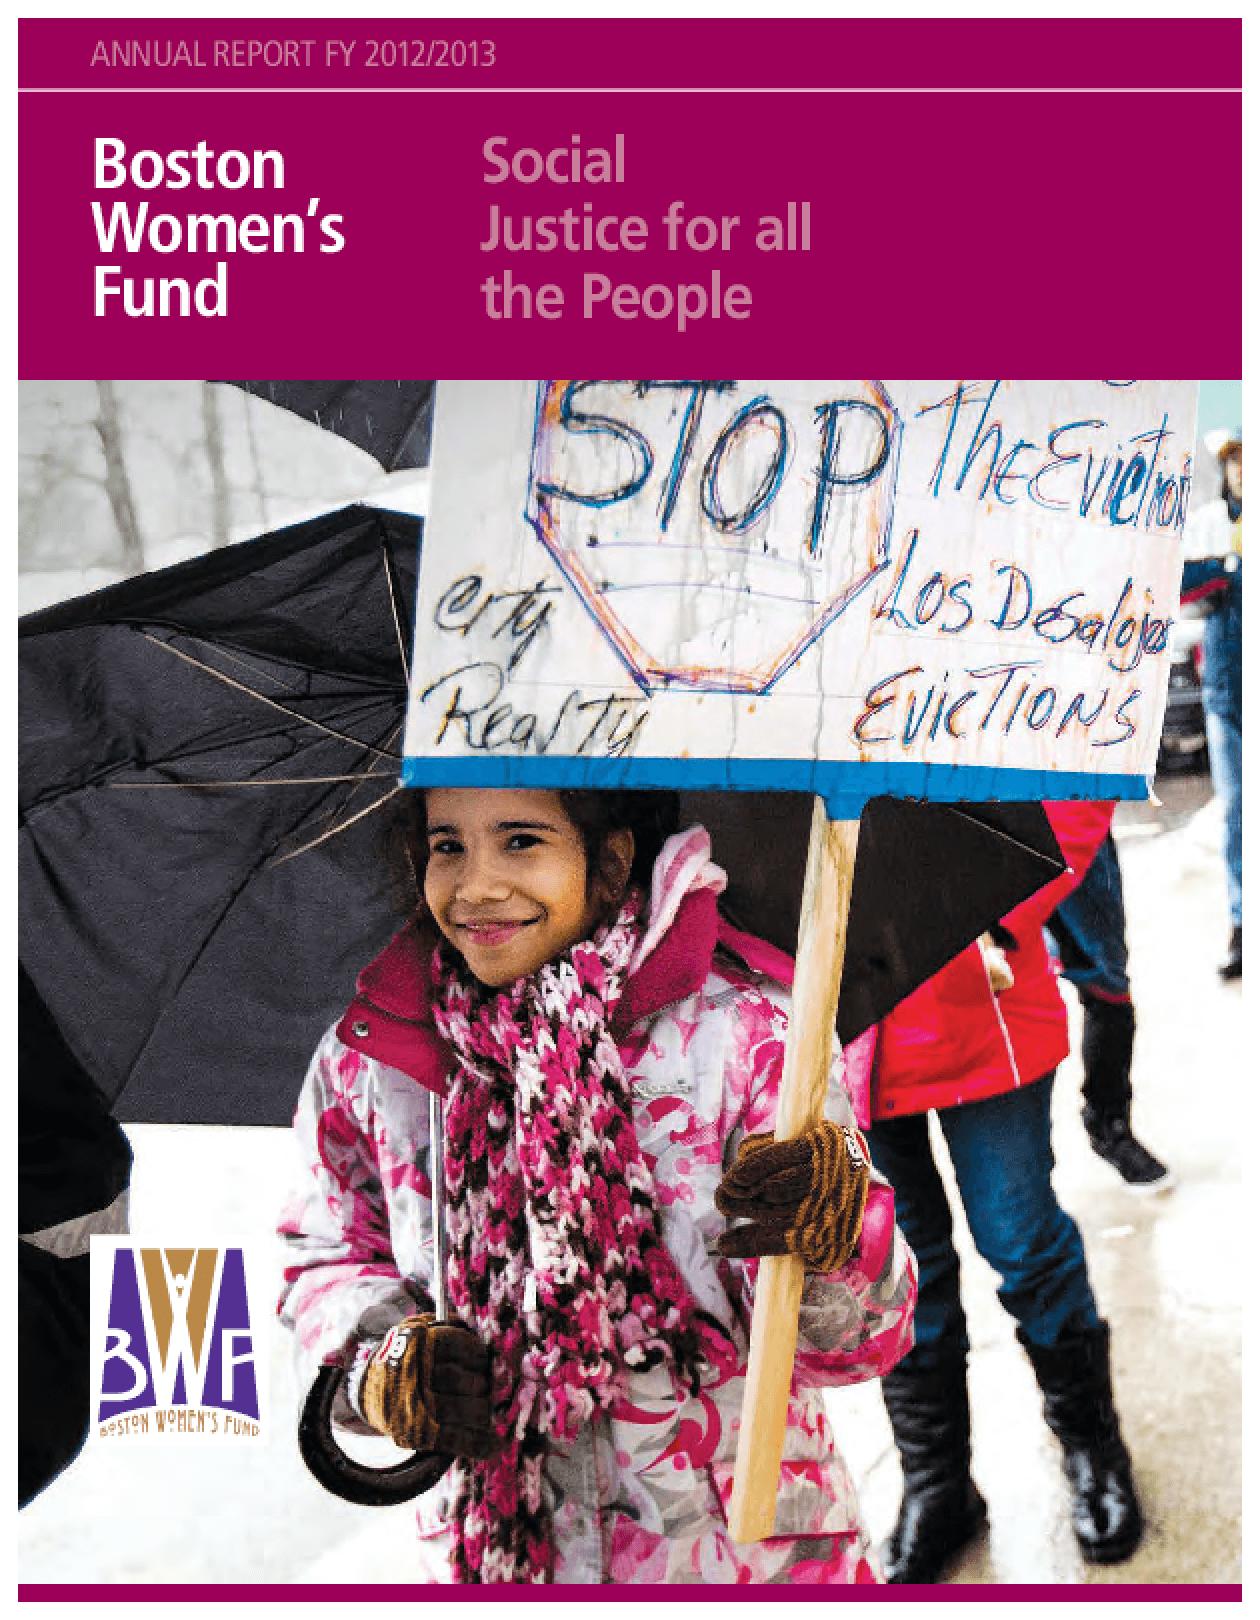 Boston Women's Fund Annual Report FY 2012/13